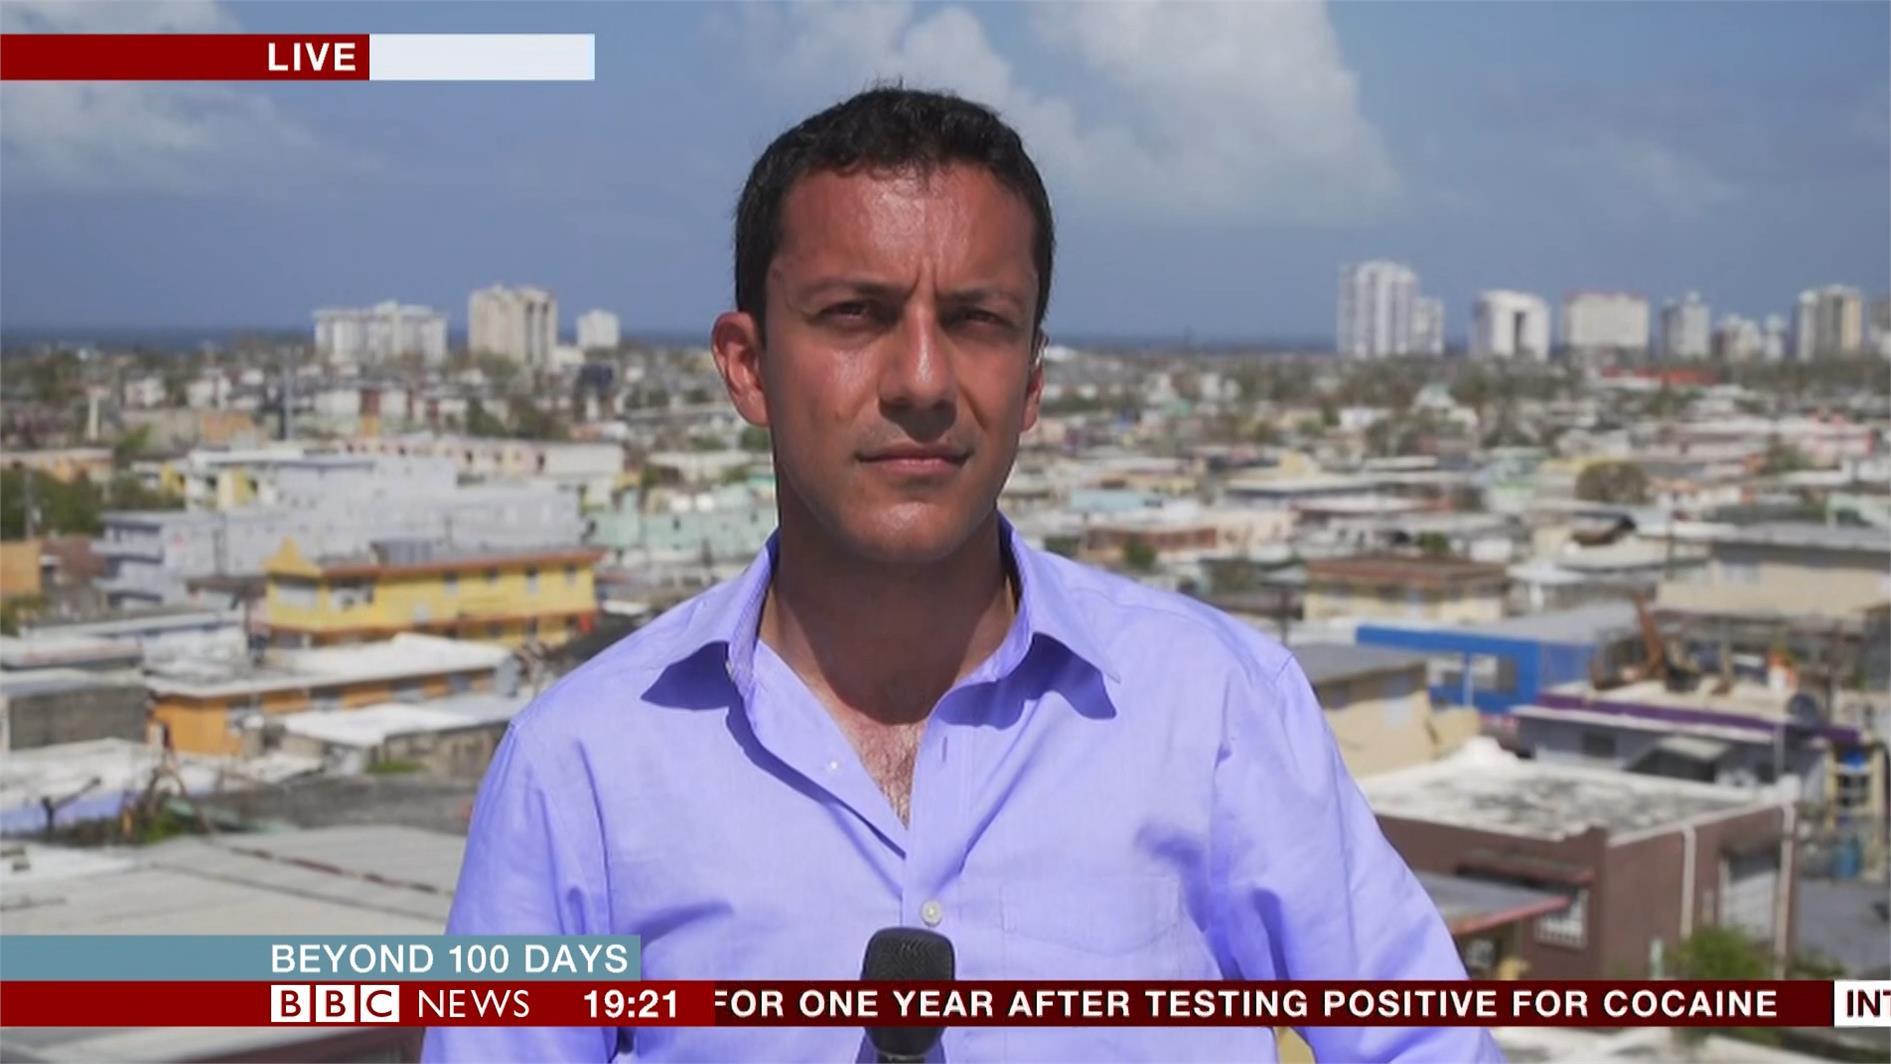 Aleem Maqbool - BBC News Correspondent (1)